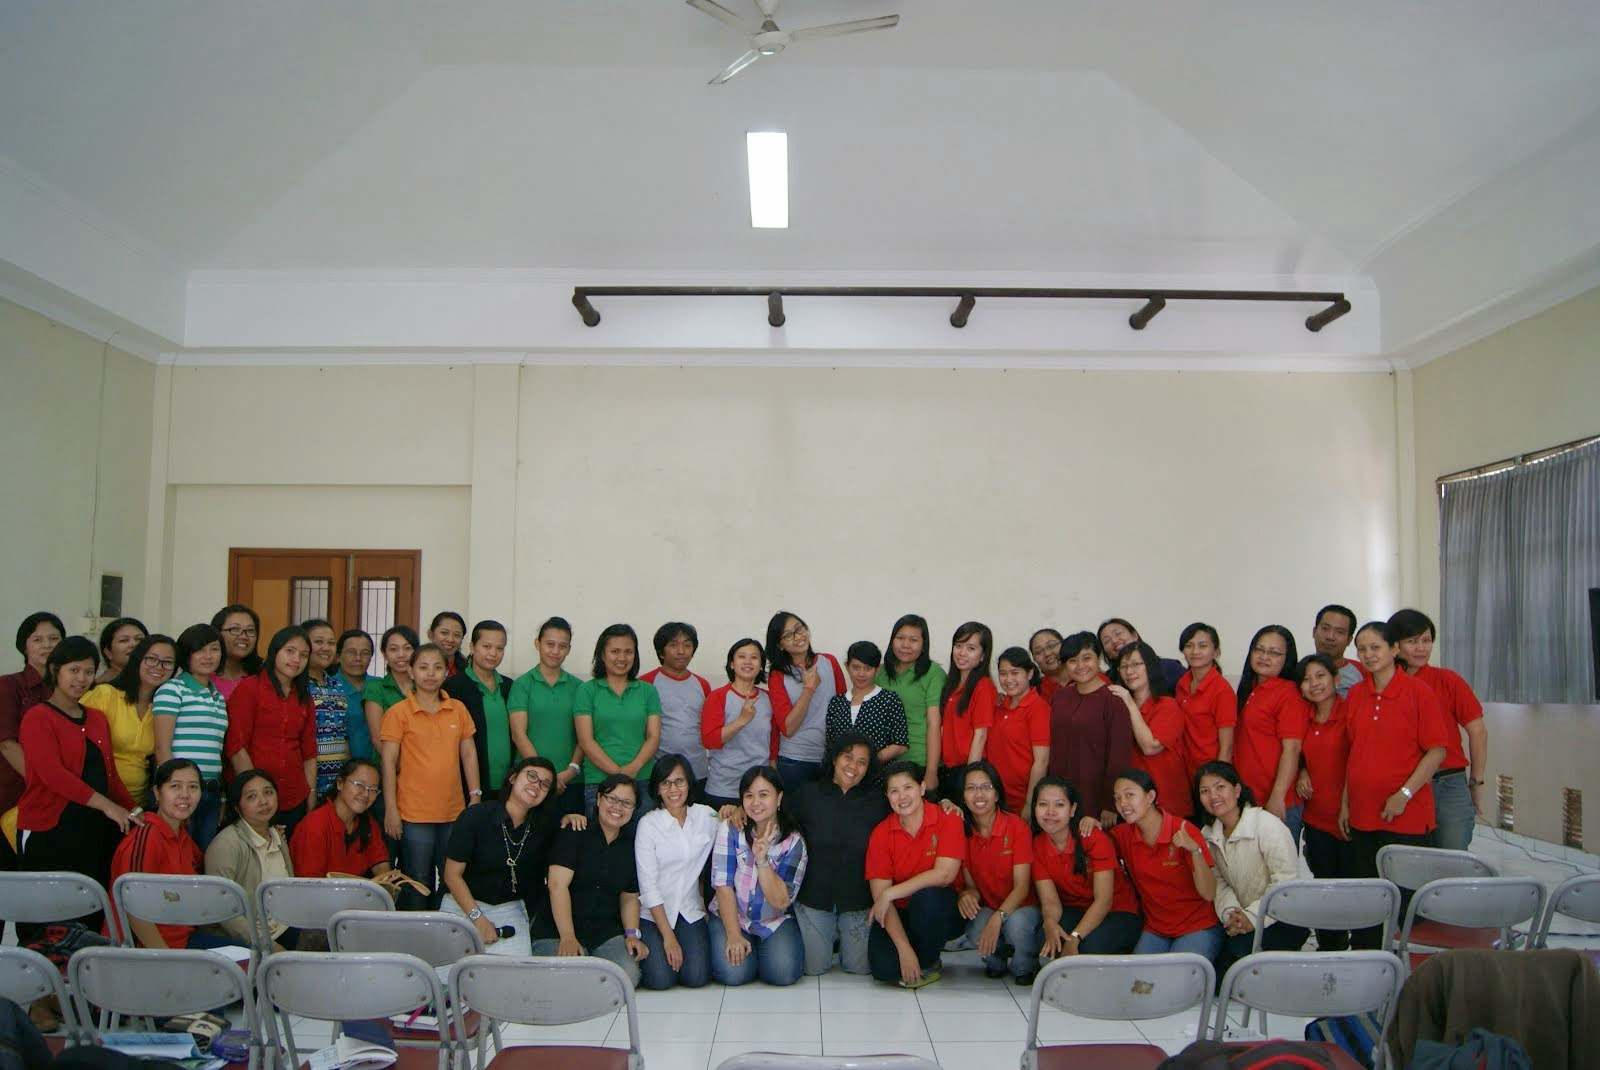 Bersama Guru-guru Play Group,TK dan SD Yayasan Salibb Suci Bandung (14 Februari 2015)